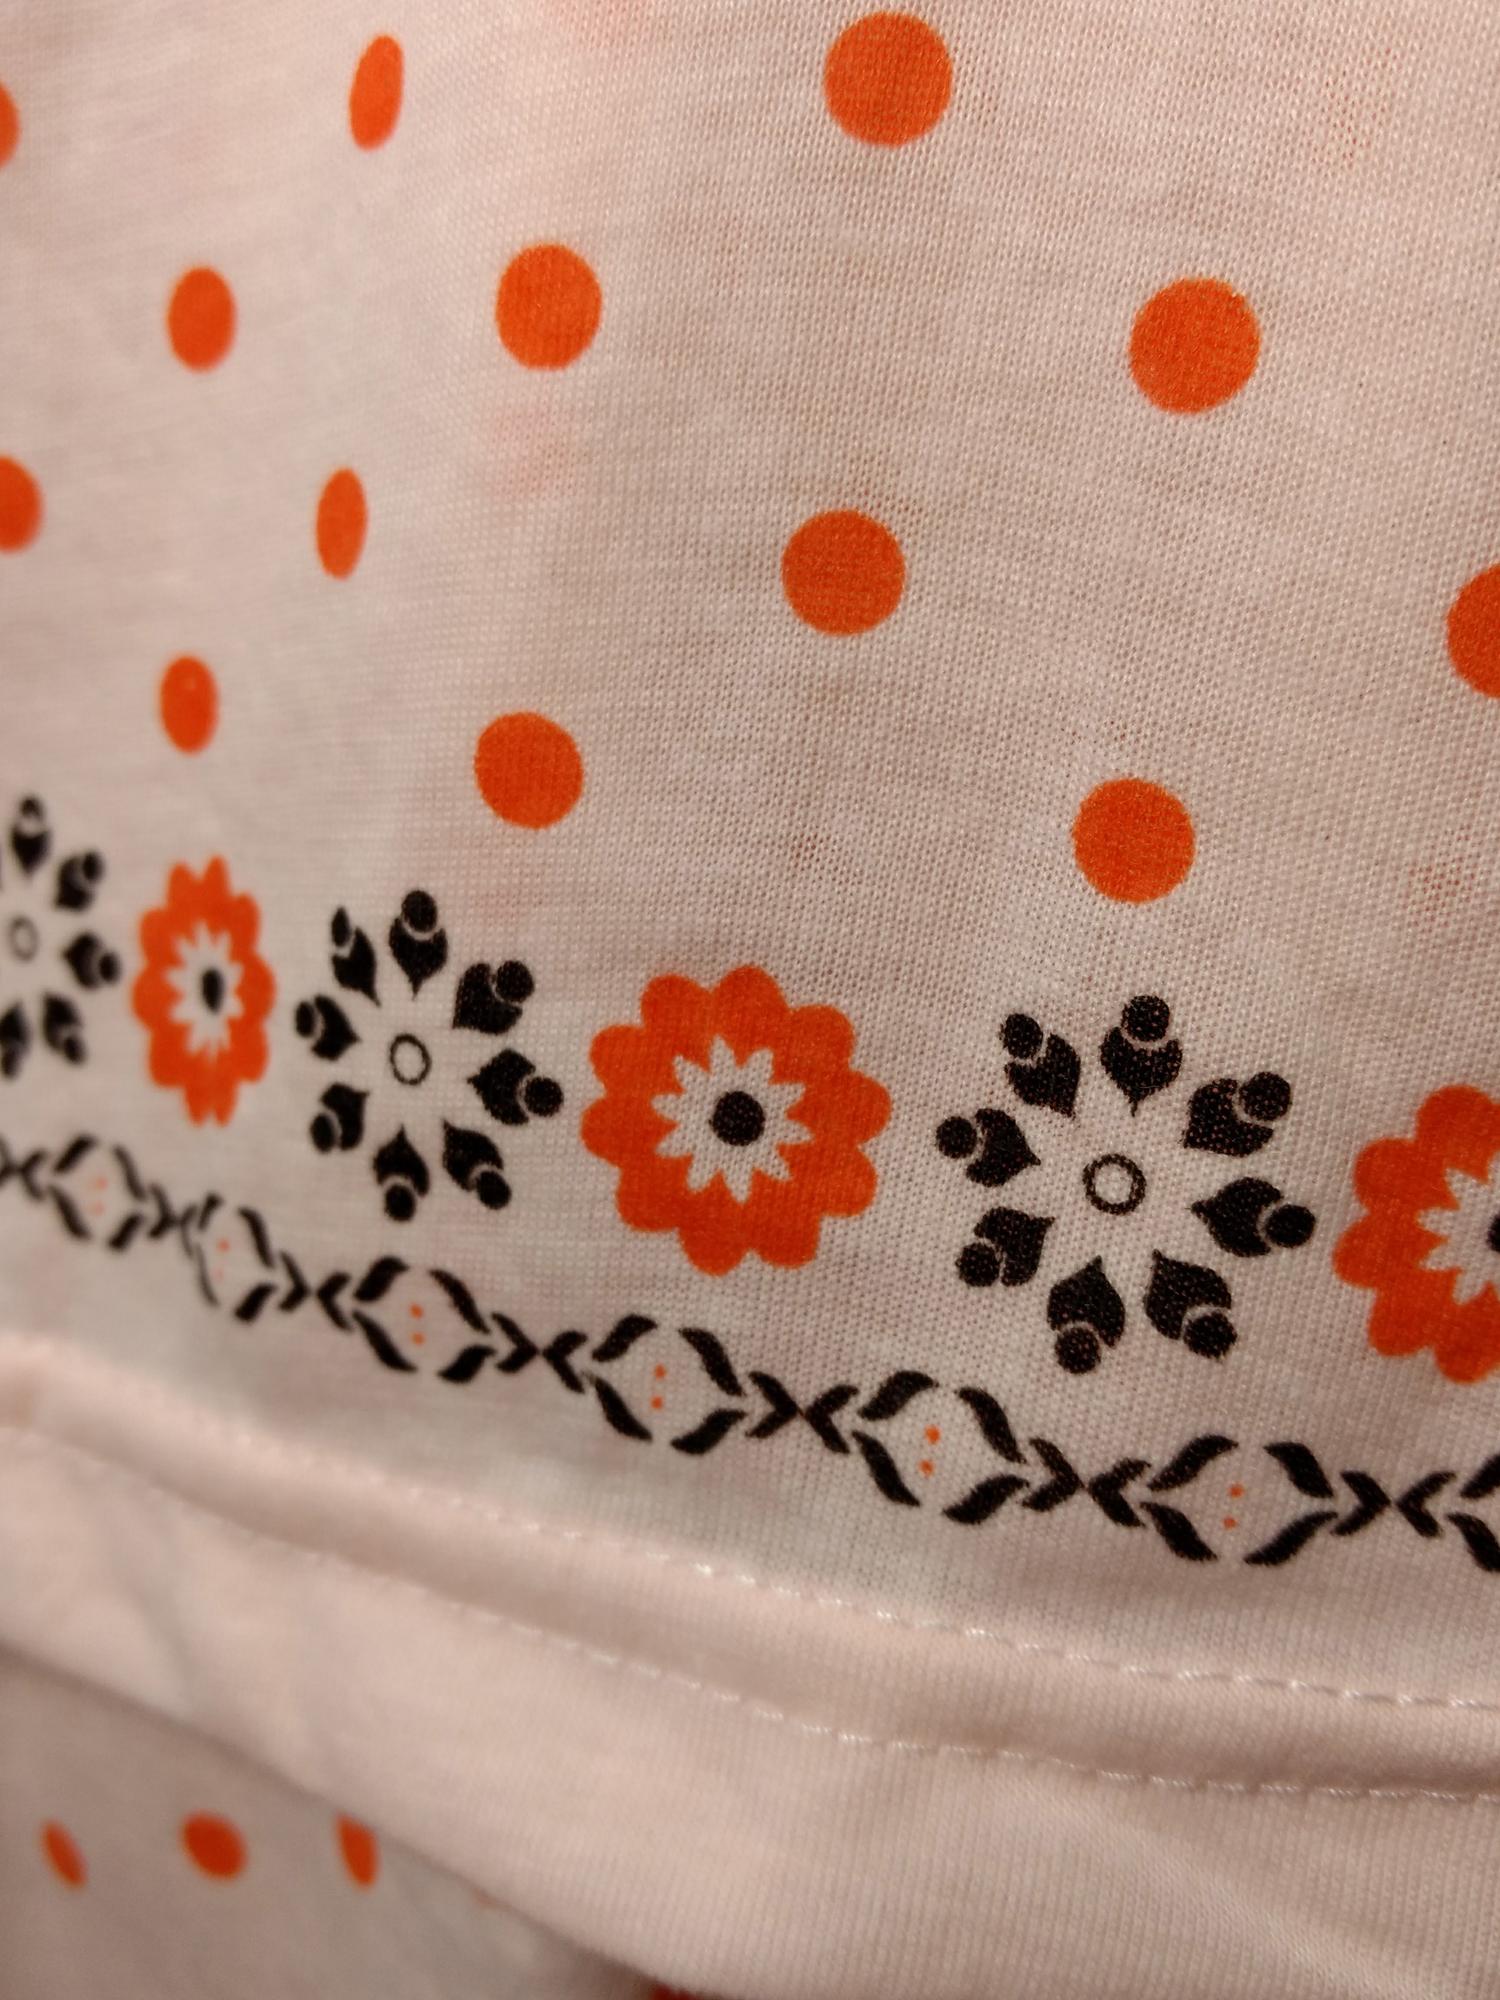 - 2XL 8 26 Lucky Women/'s Polka Dot 3//4 Bottoms Pyjama Set with Eye Mask S